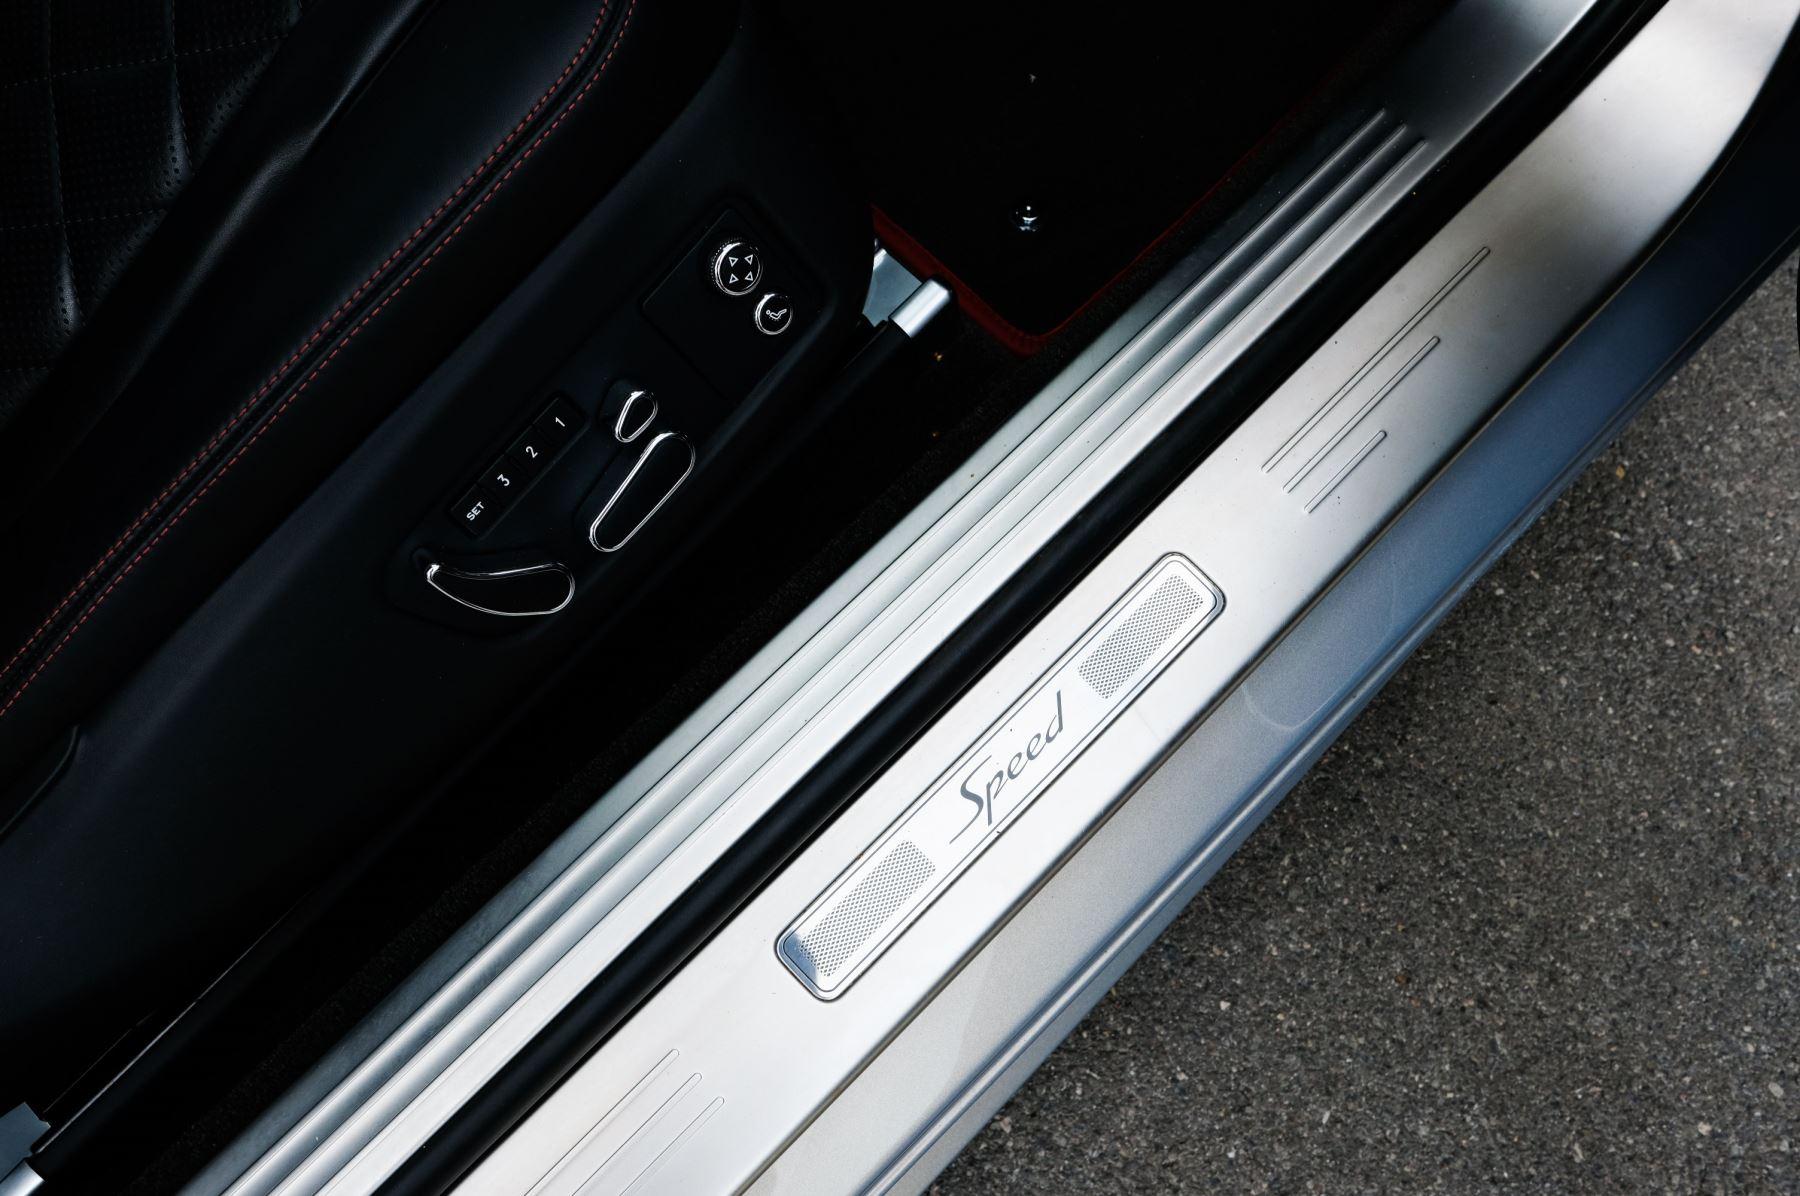 Bentley Continental GT 6.0 W12 [635] Speed - Premier Specification - Carbon Fibre Fascia Panels image 18